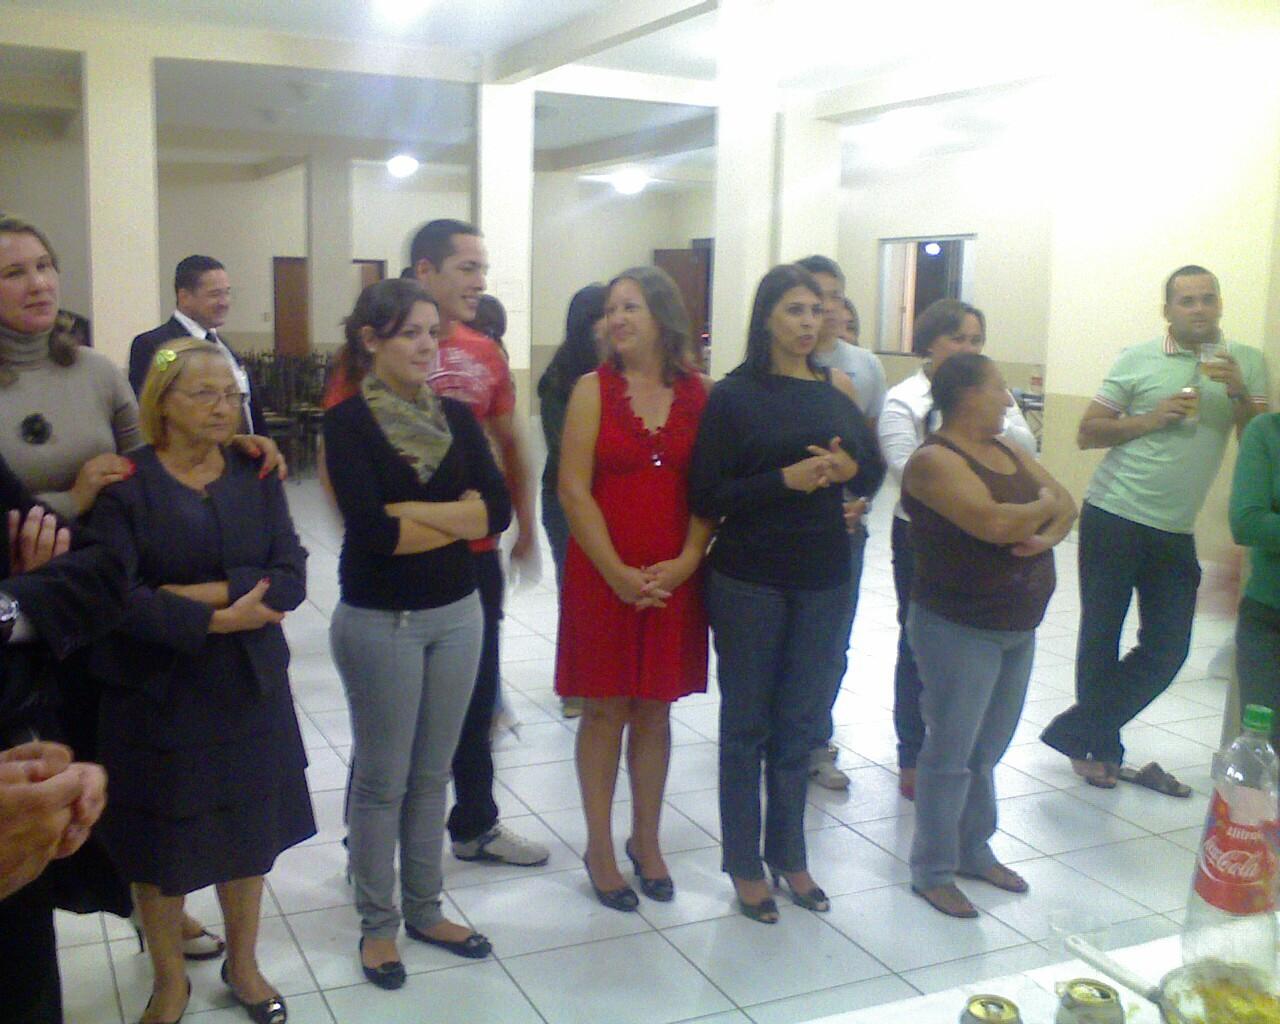 Feliz Aniversário Renato Irmão: LOJA MAÇÔNICA SETE DE SETEMBRO VII: FELIZ ANIVERSÁRIO